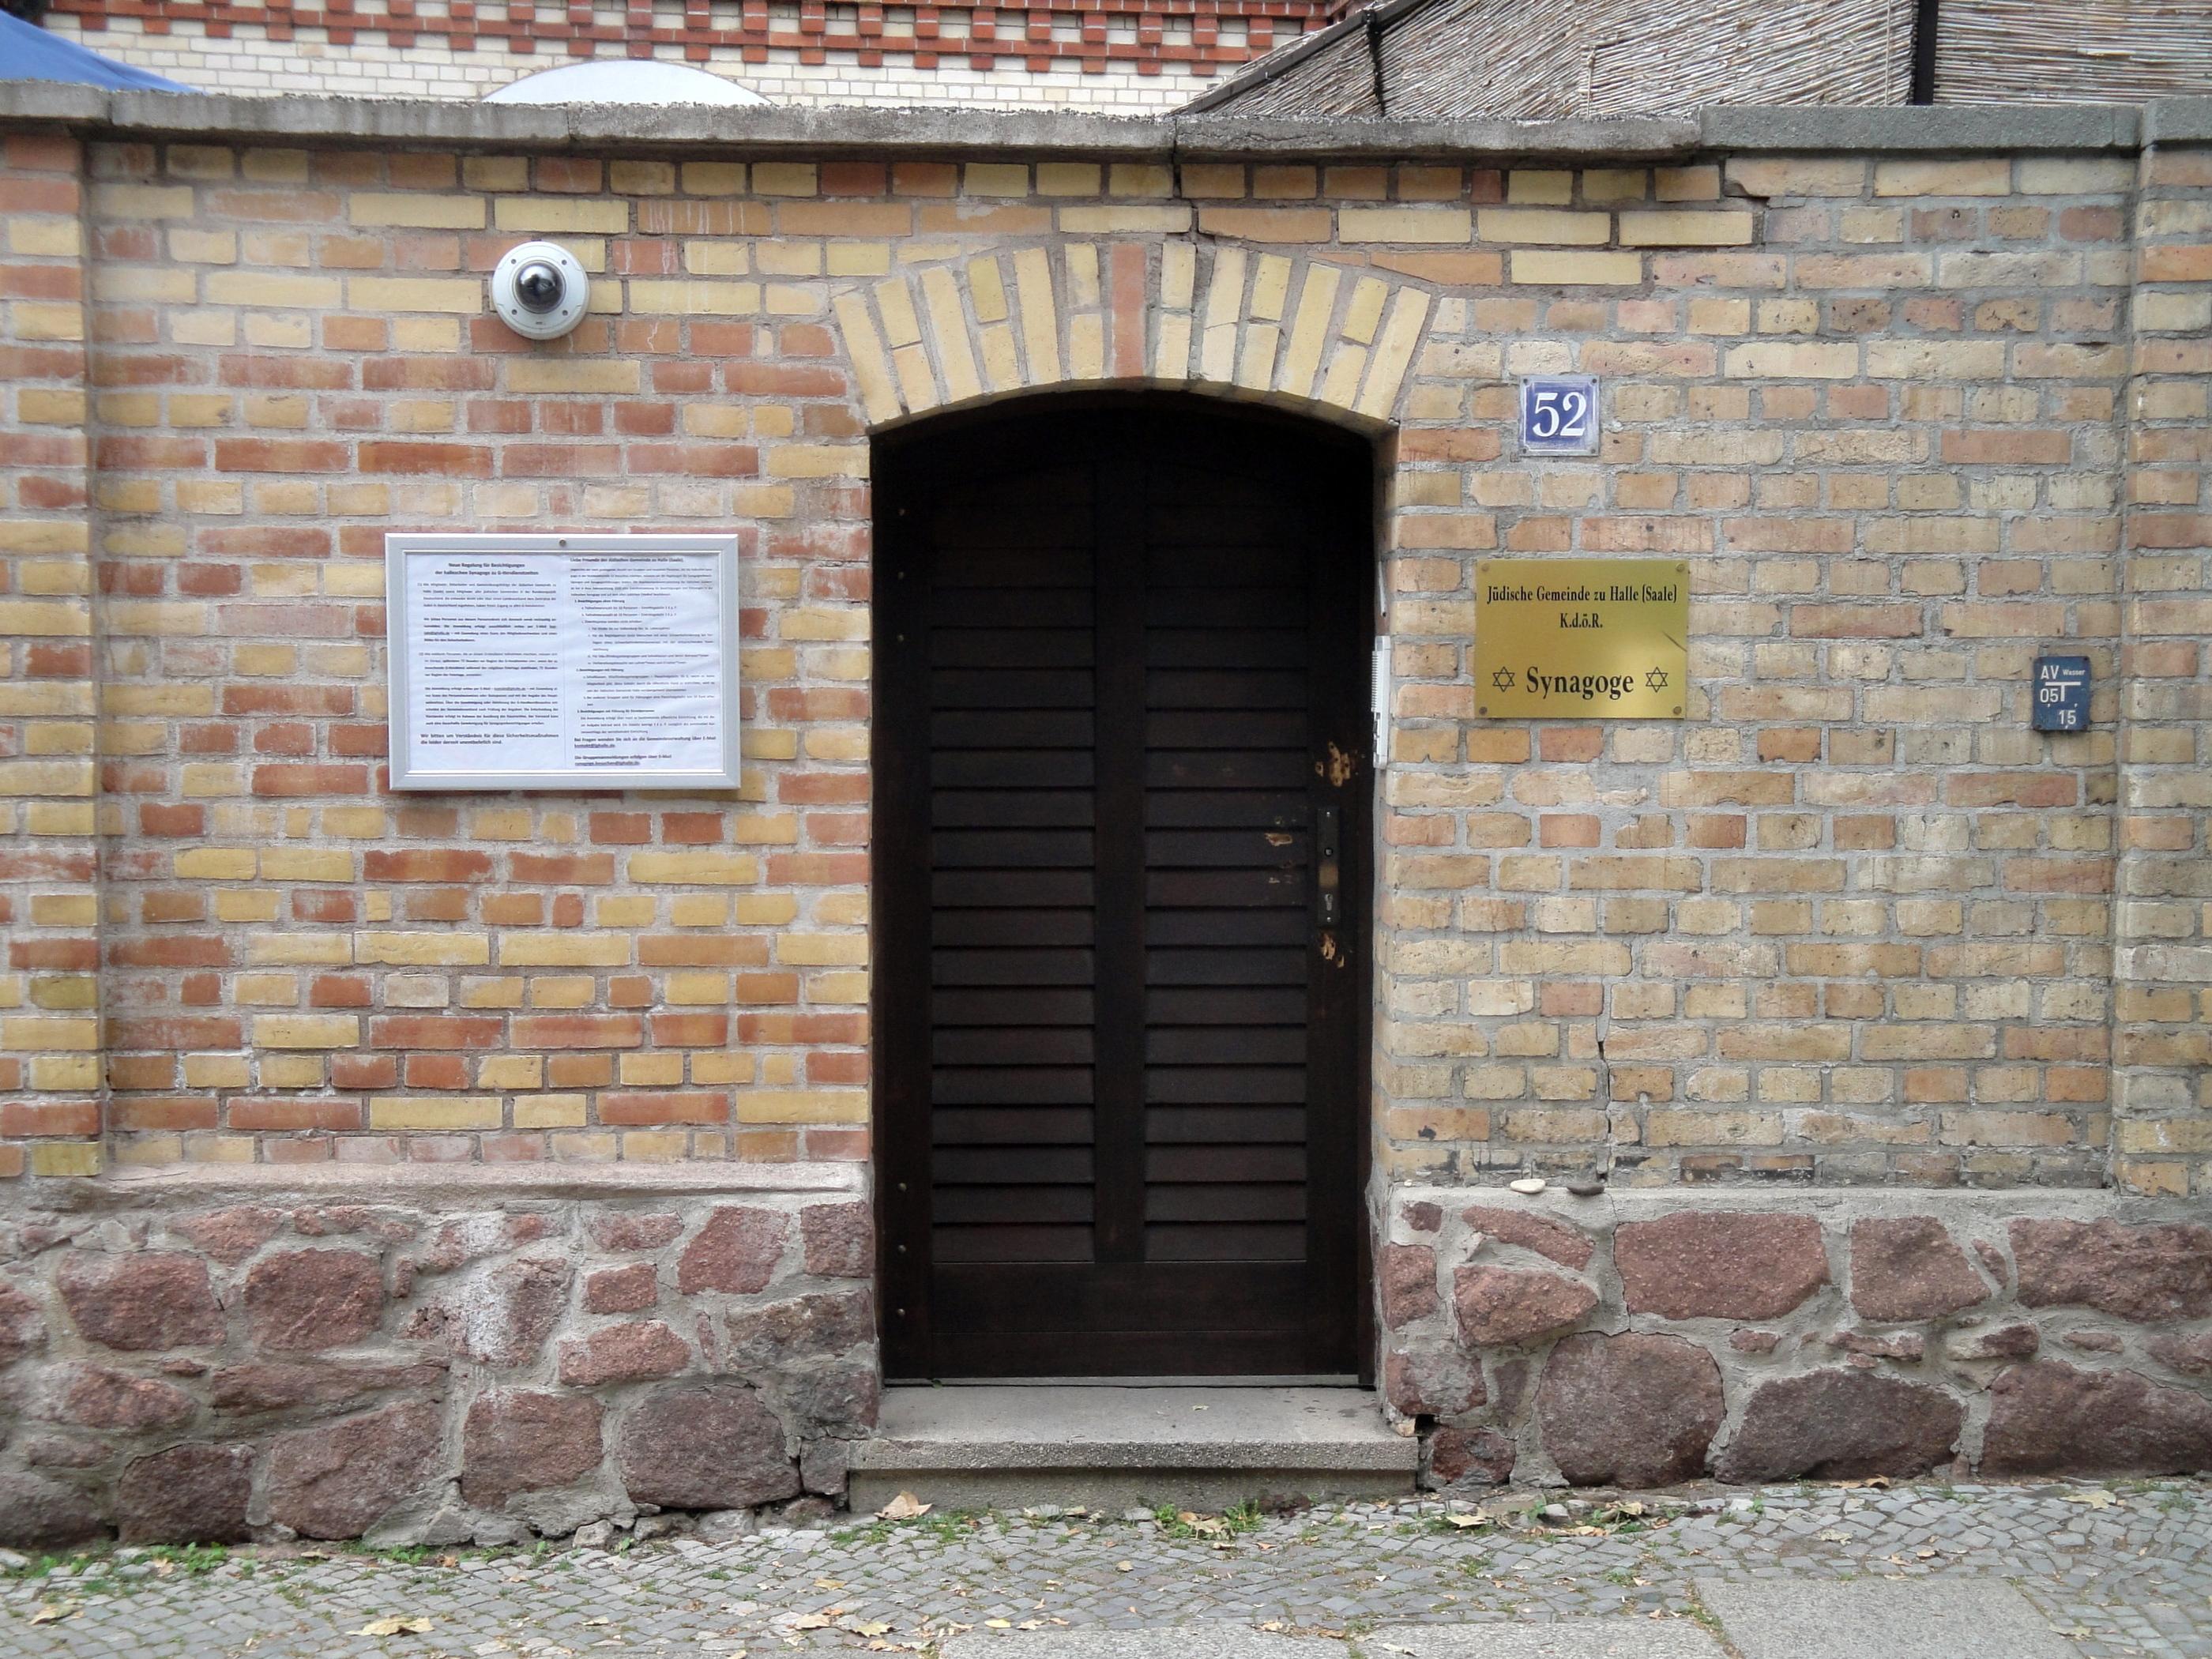 Halle_Synagoge_Tür_(03).jpg (2800×2100)